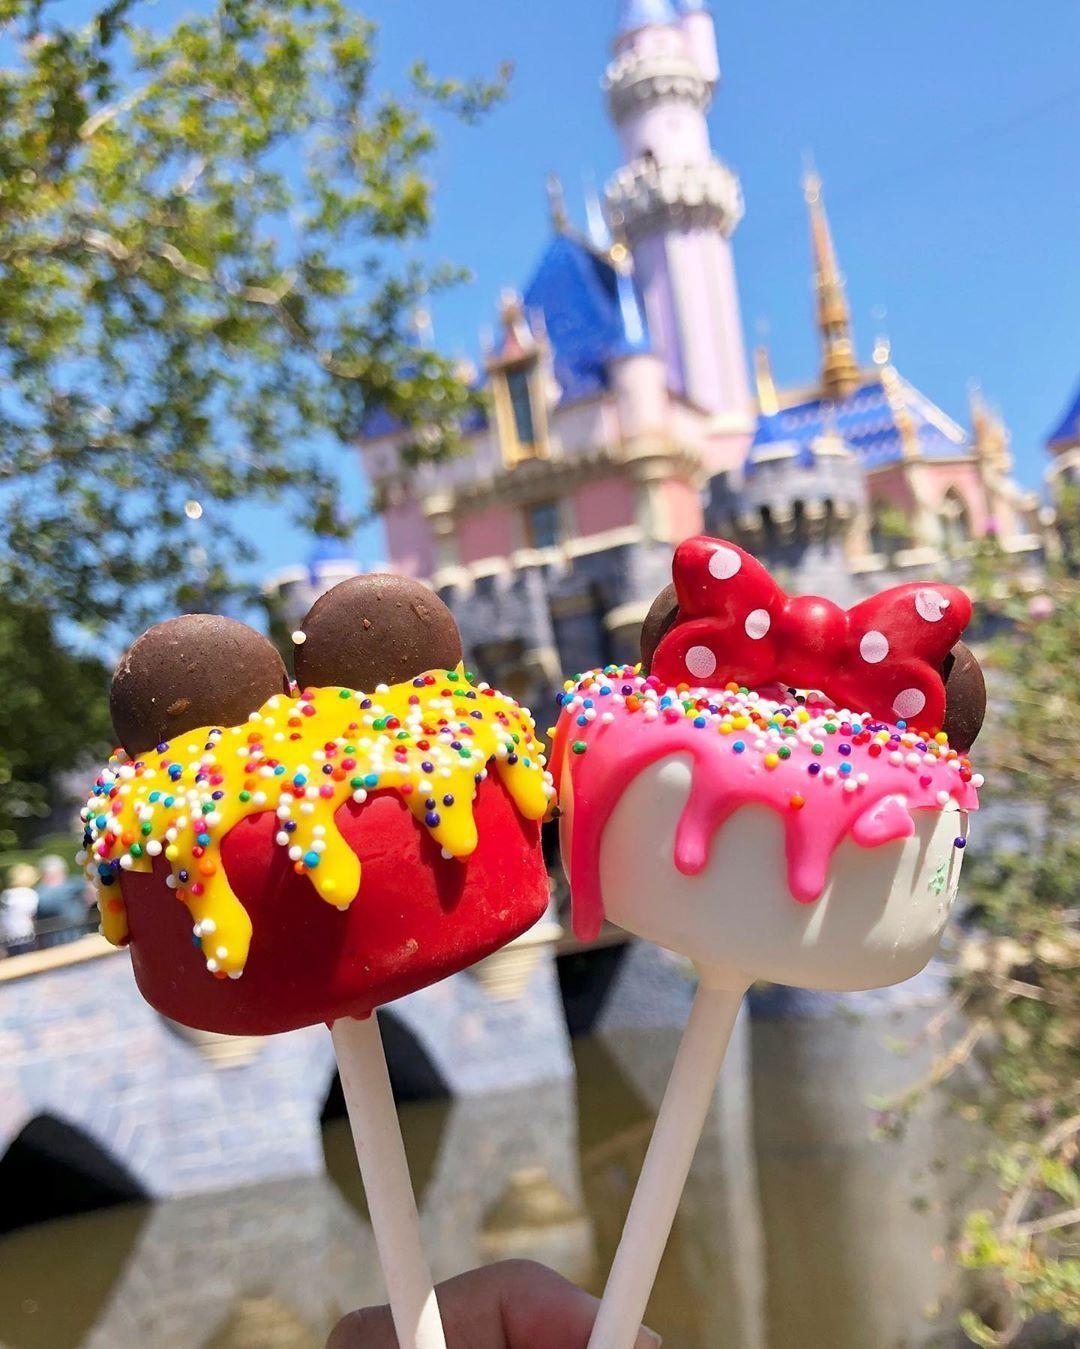 Disney Food Blog On Instagram Happy Birthday In 2020 Disney Food Disney Desserts Disney Food Blog